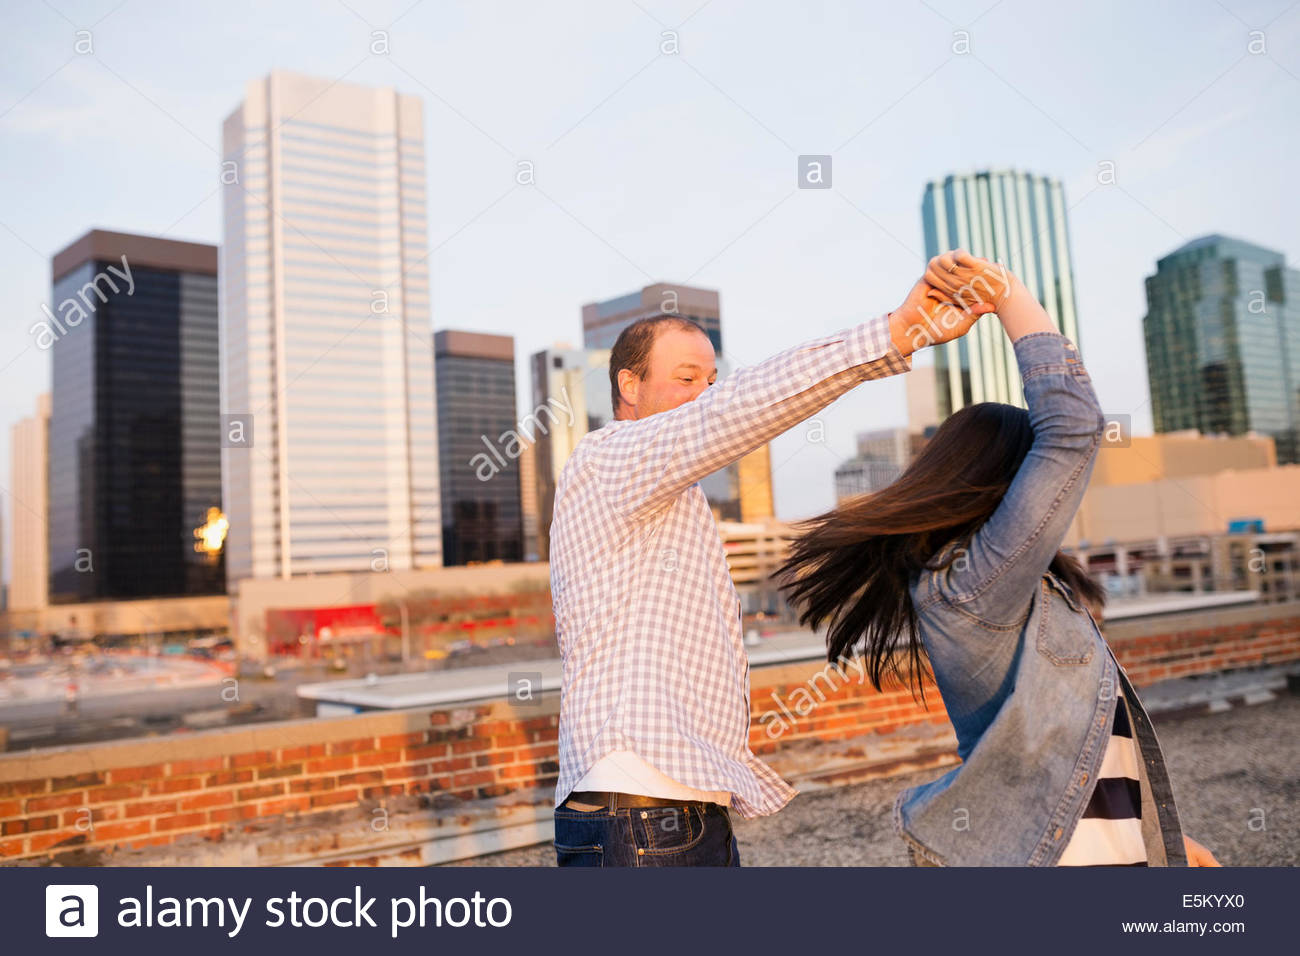 Couple dancing on urban rooftop - Stock Image